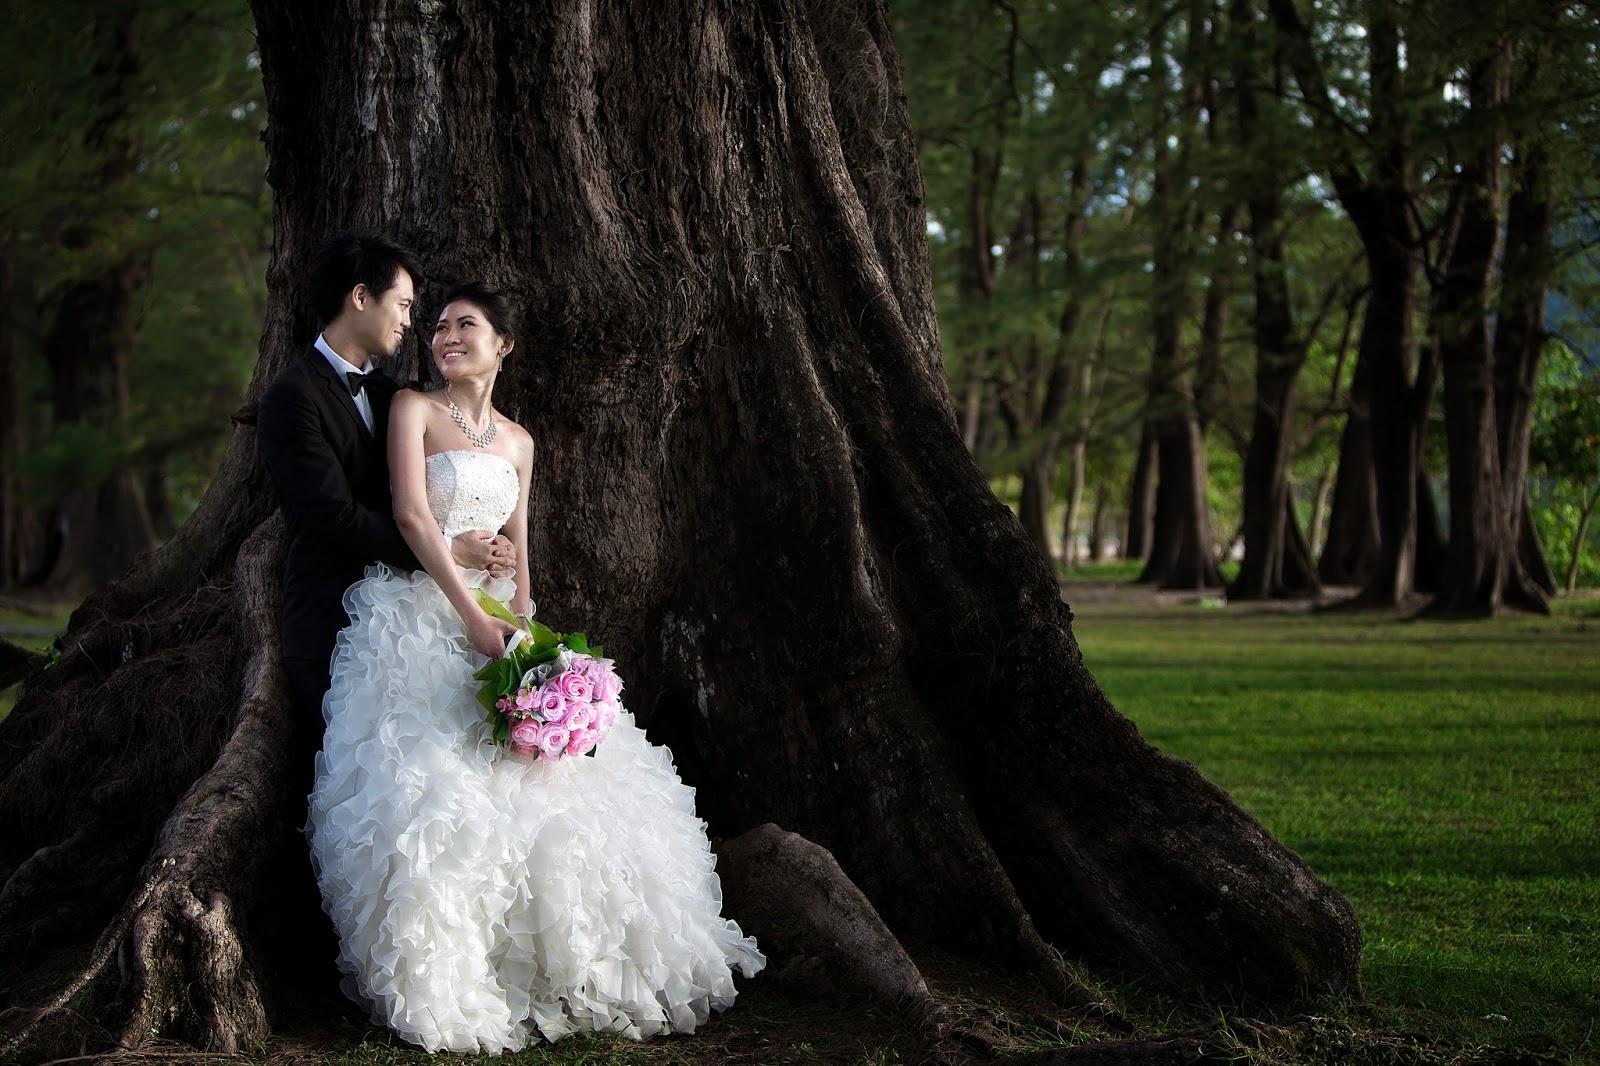 Pre Wedding In Phuket Thailand By Phoketphotographythailand